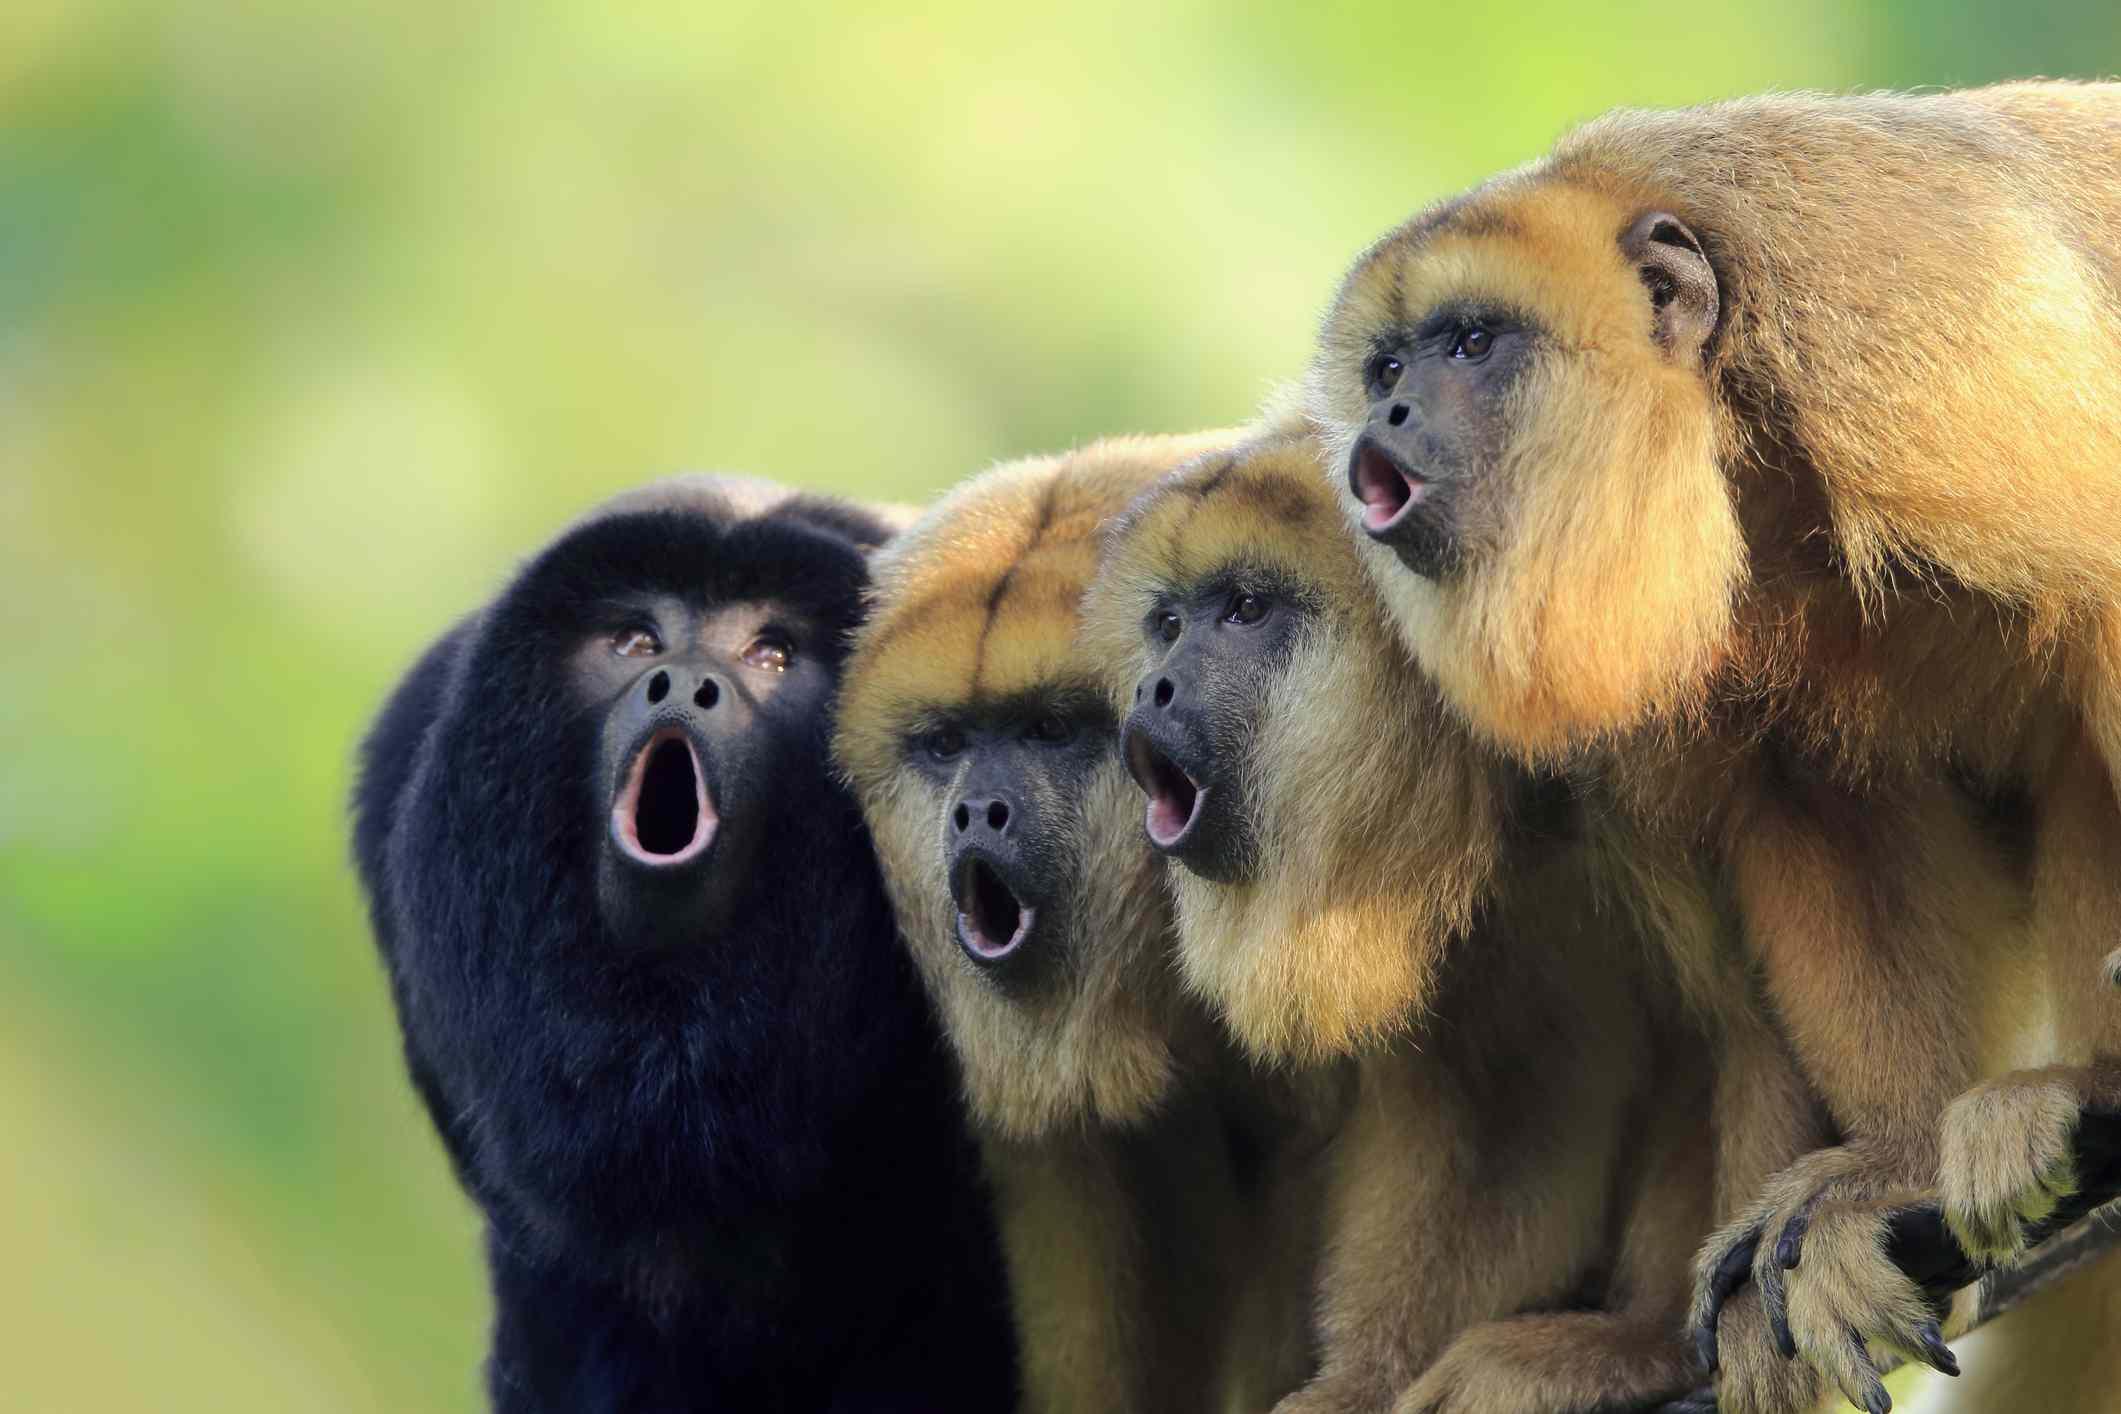 Male and female howler monkeys